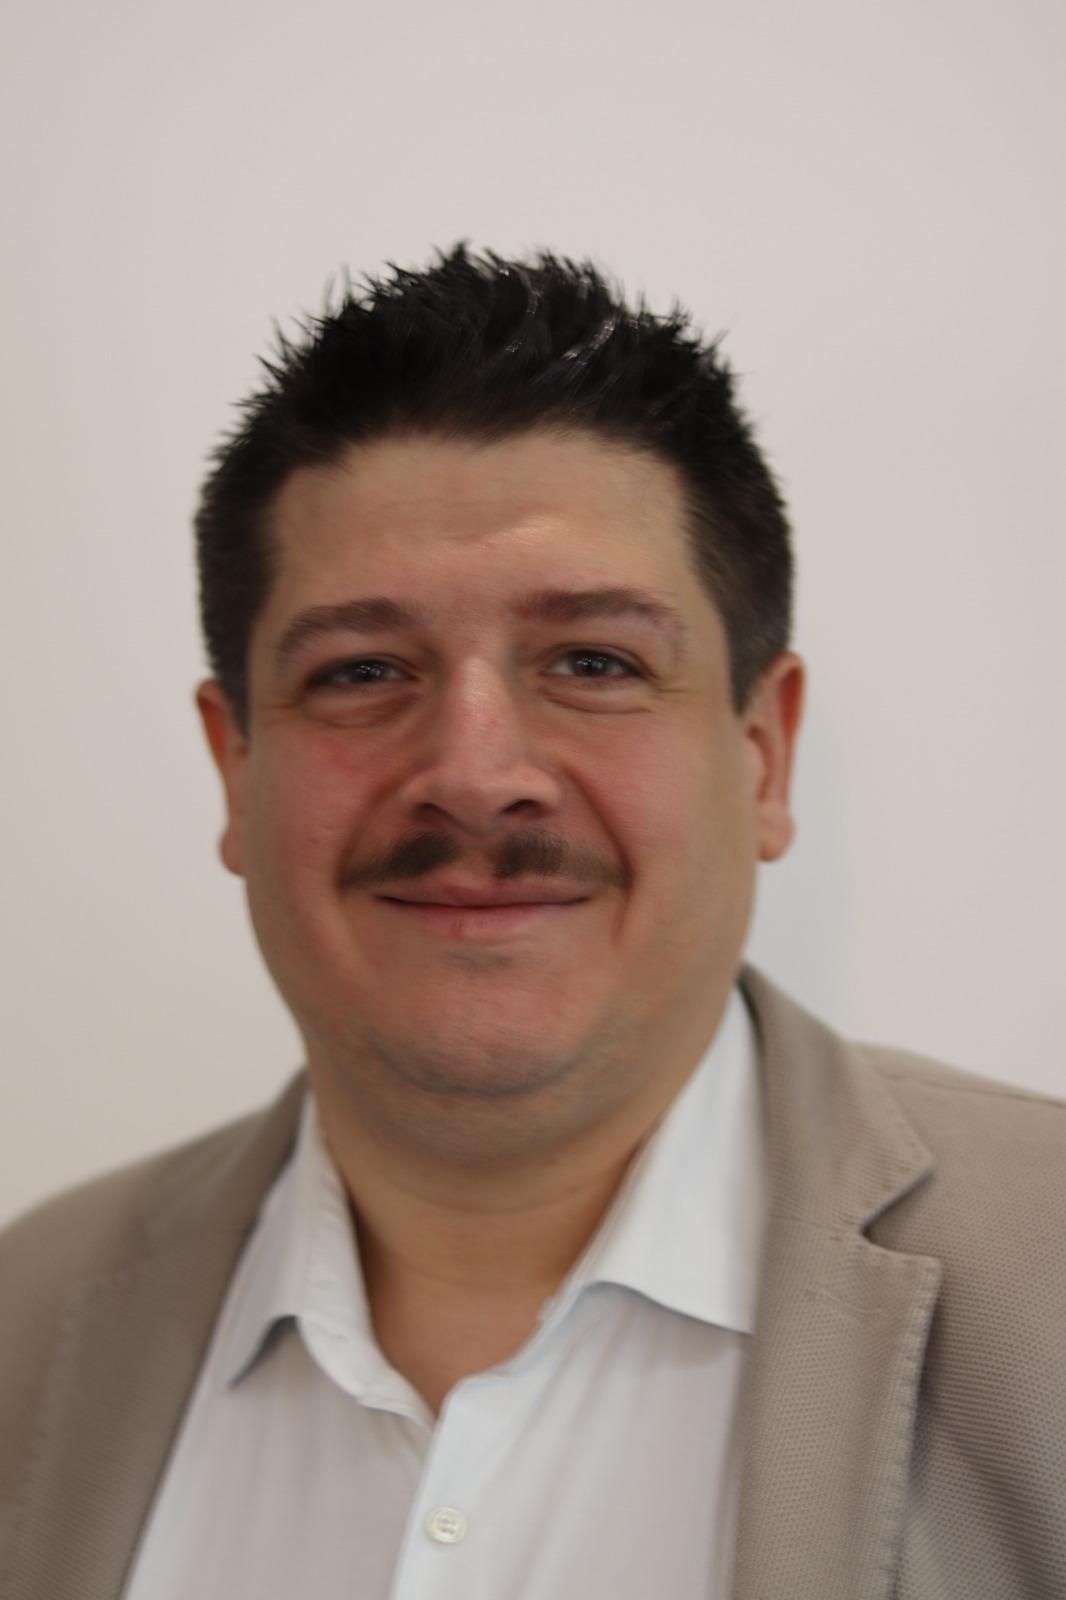 CBN host Milano